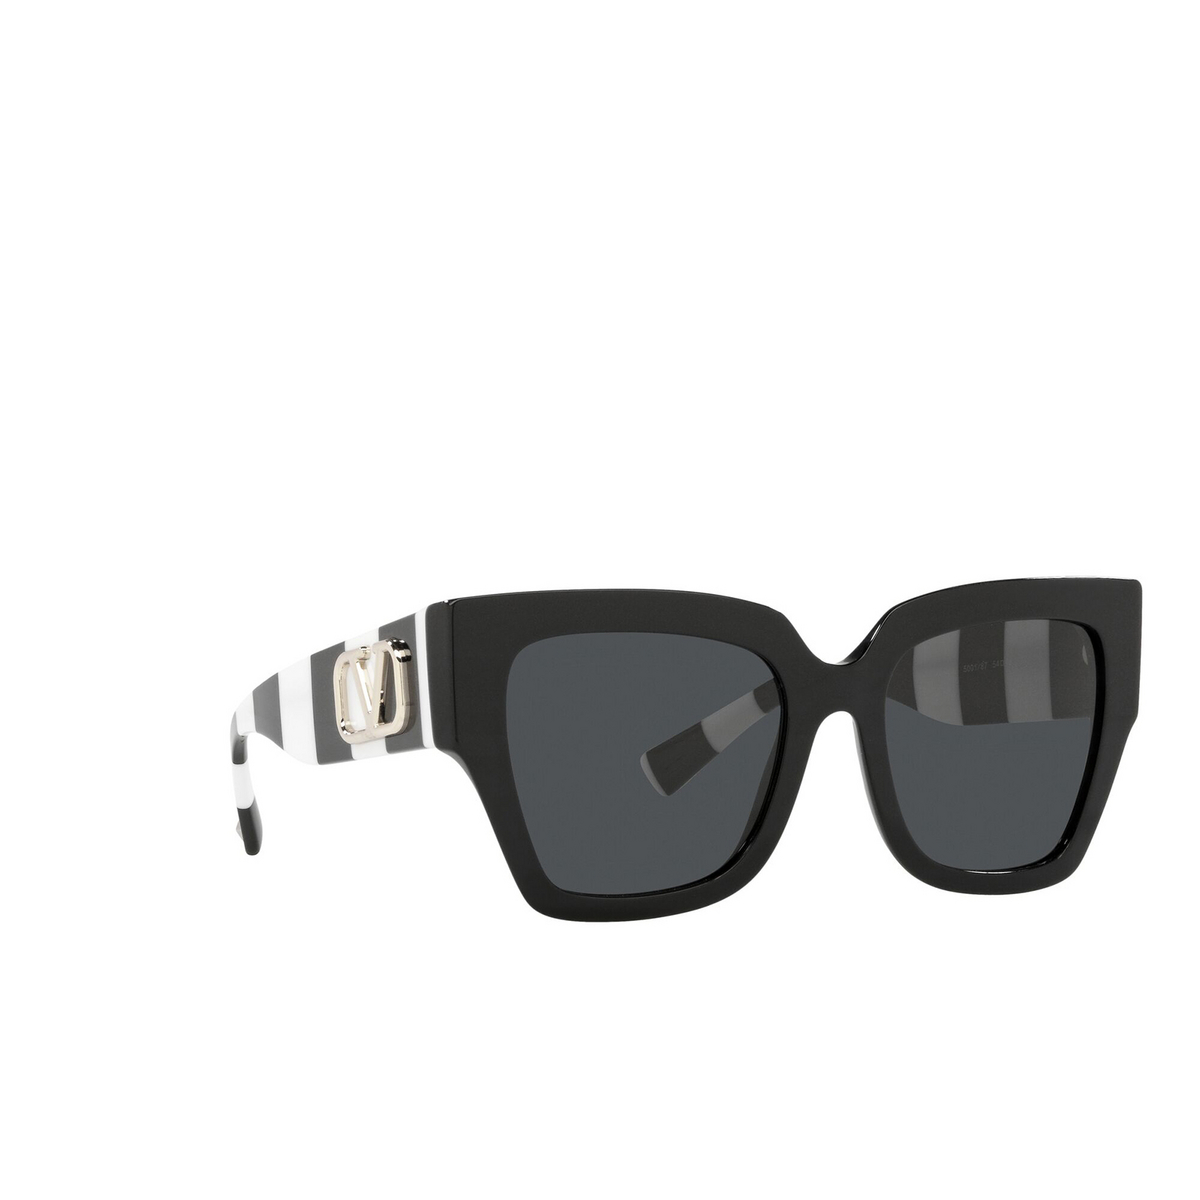 Valentino® Square Sunglasses: VA4082 color Black 500187 - three-quarters view.